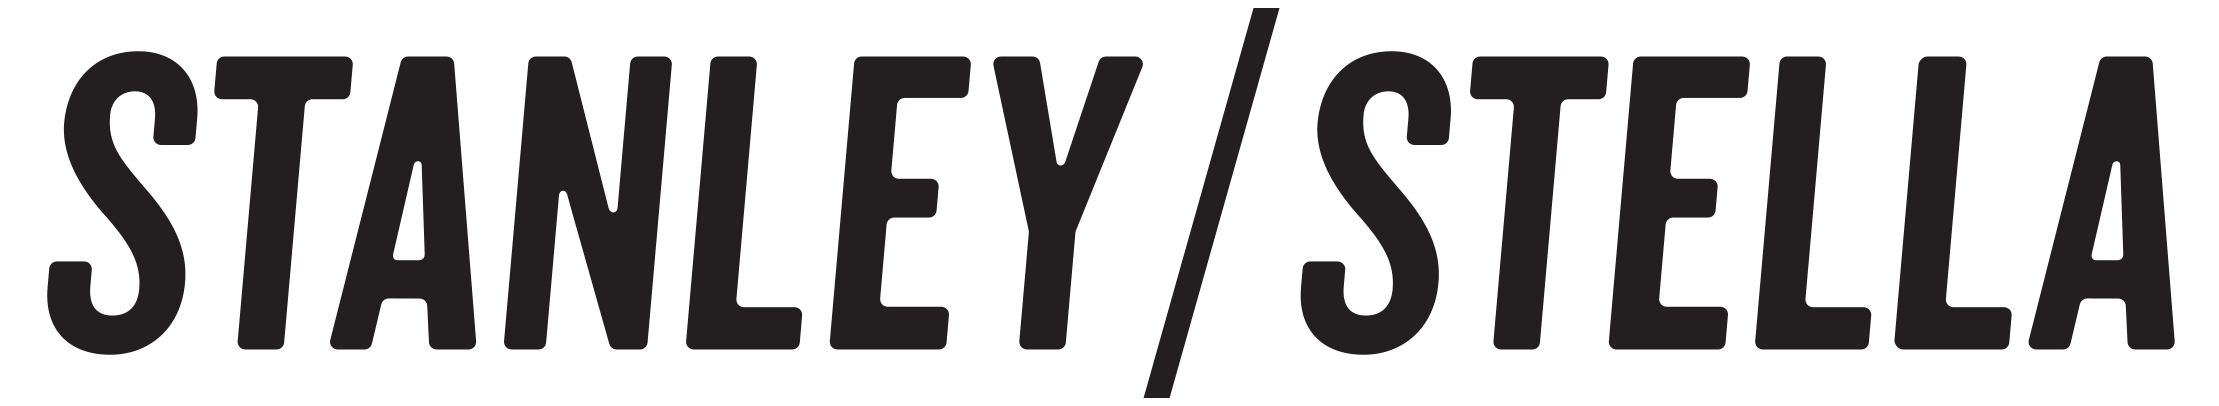 Logo Stanley / Stella